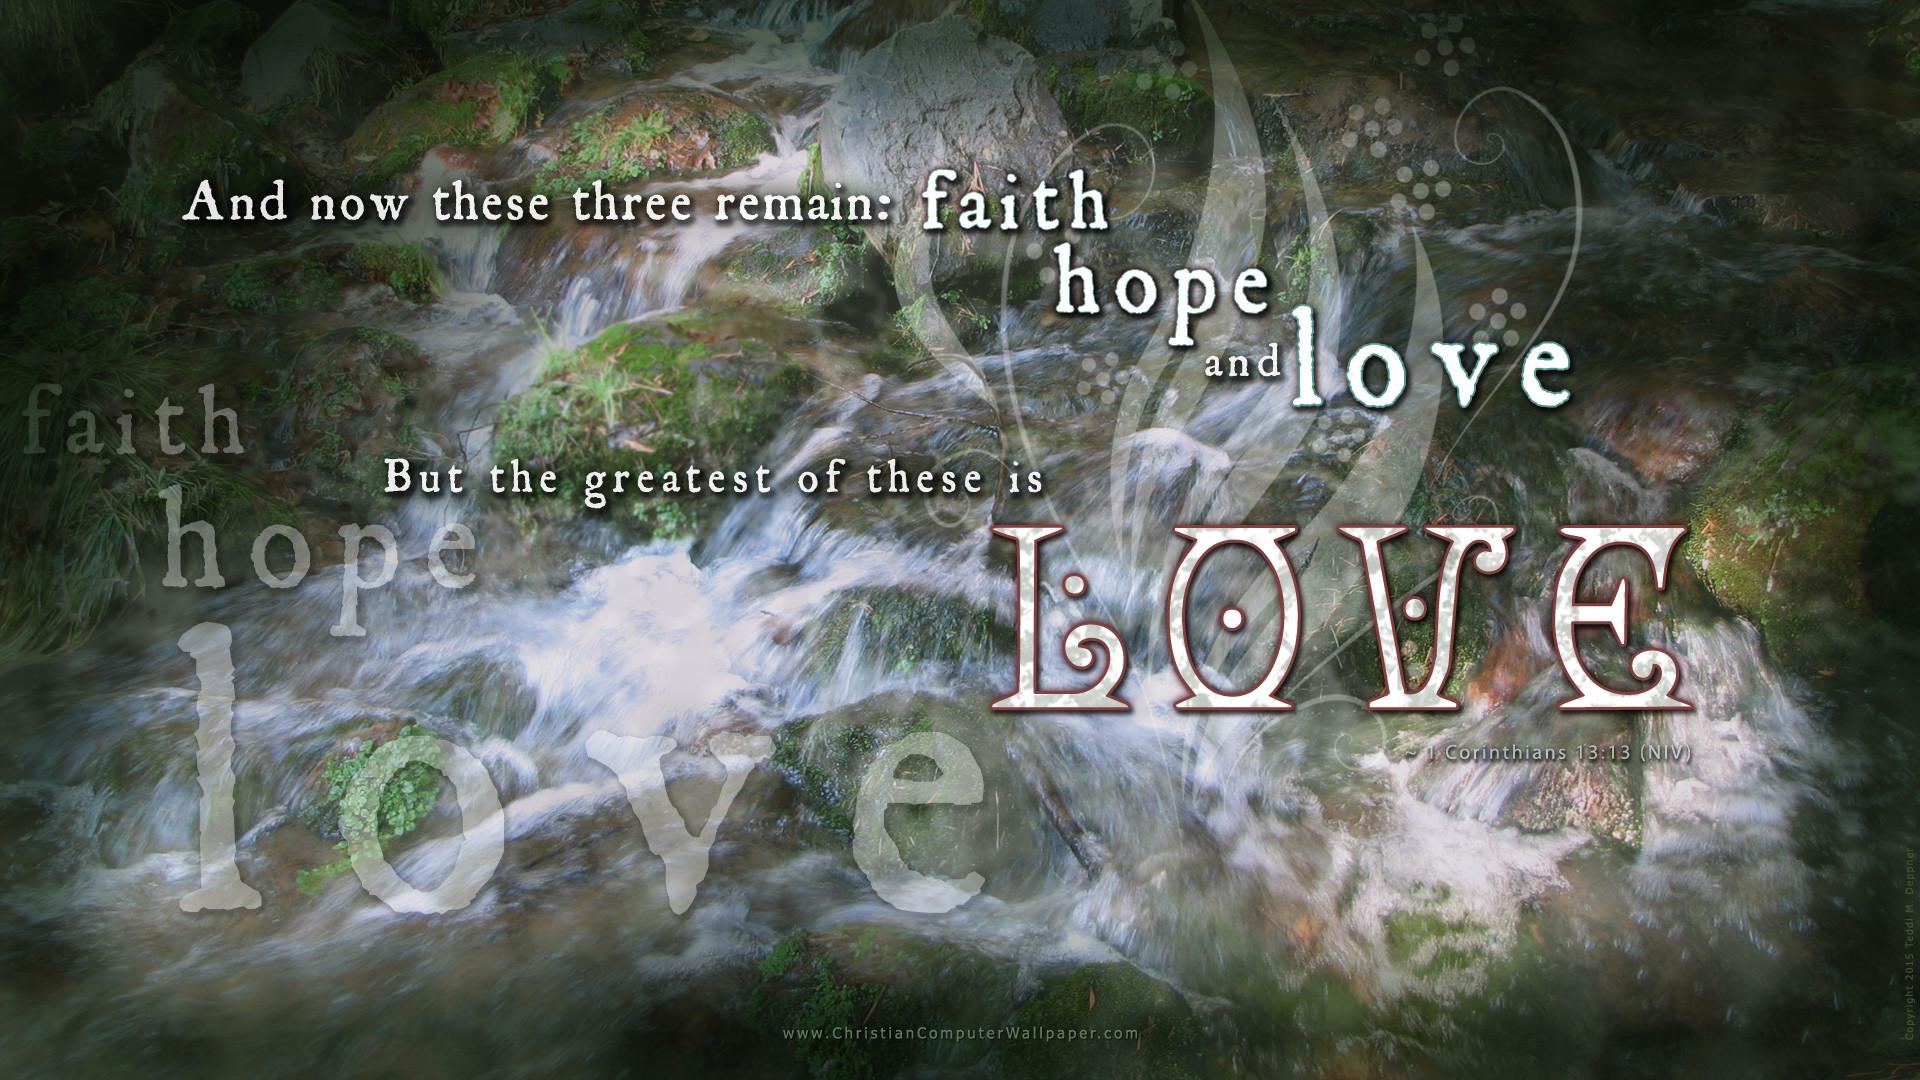 Featured Scripture: 1 Corinthians 13:13